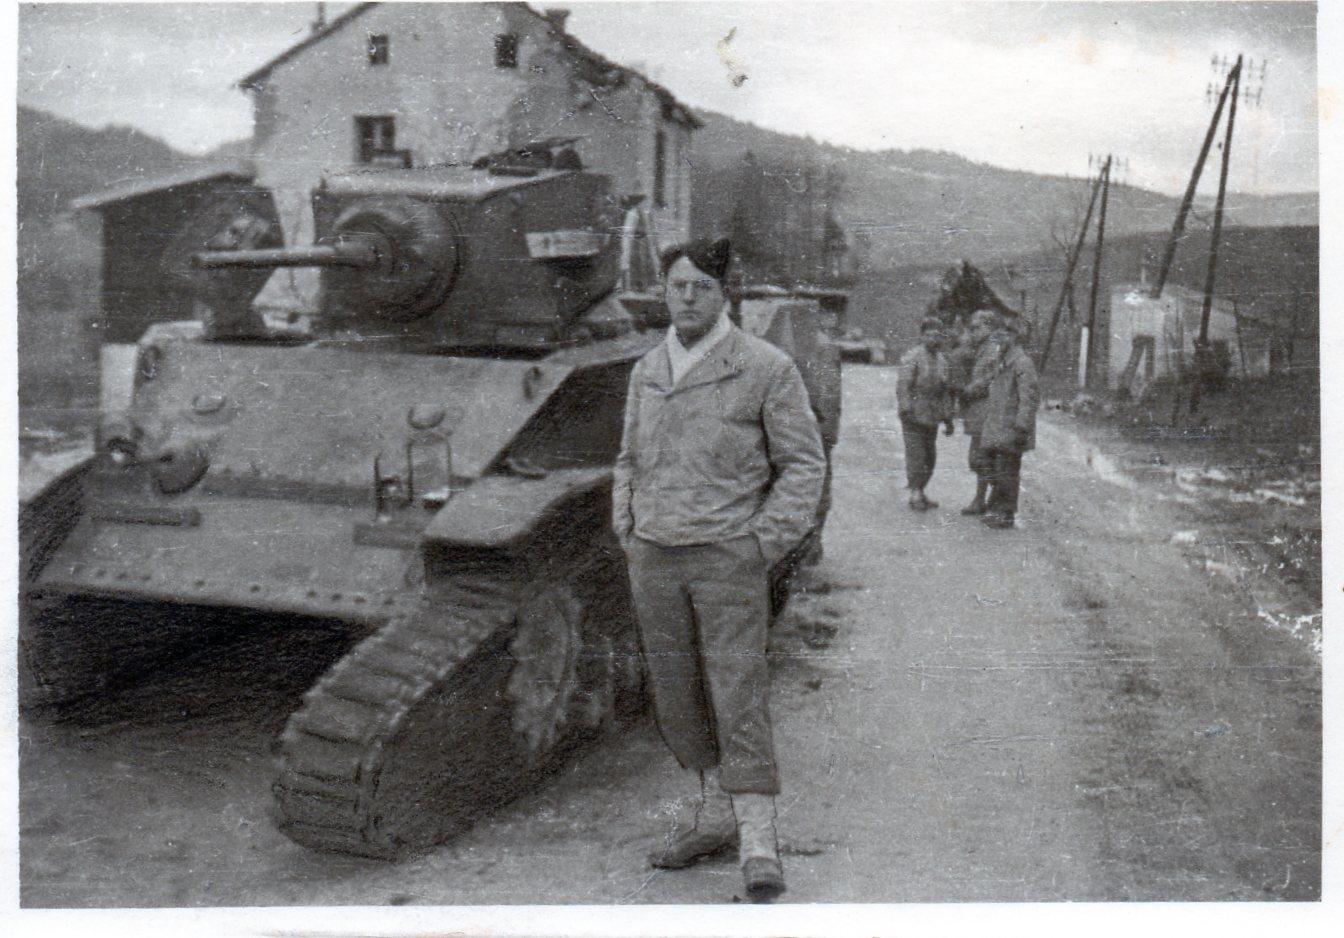 1944 11 21 le tholy 21 novembre 1944 caniot